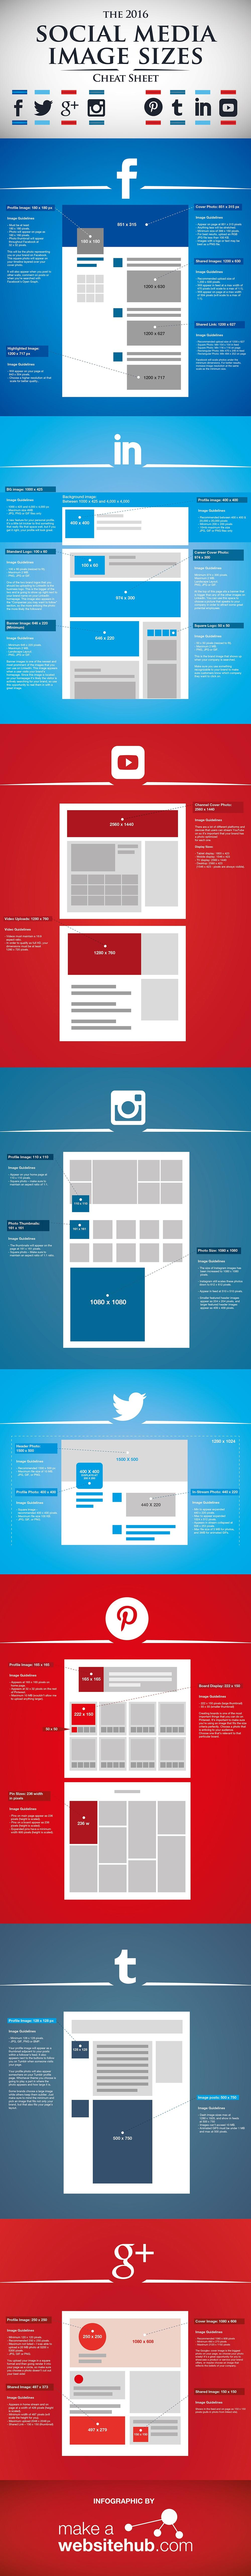 [Infographic] - Social Media Image Sizes